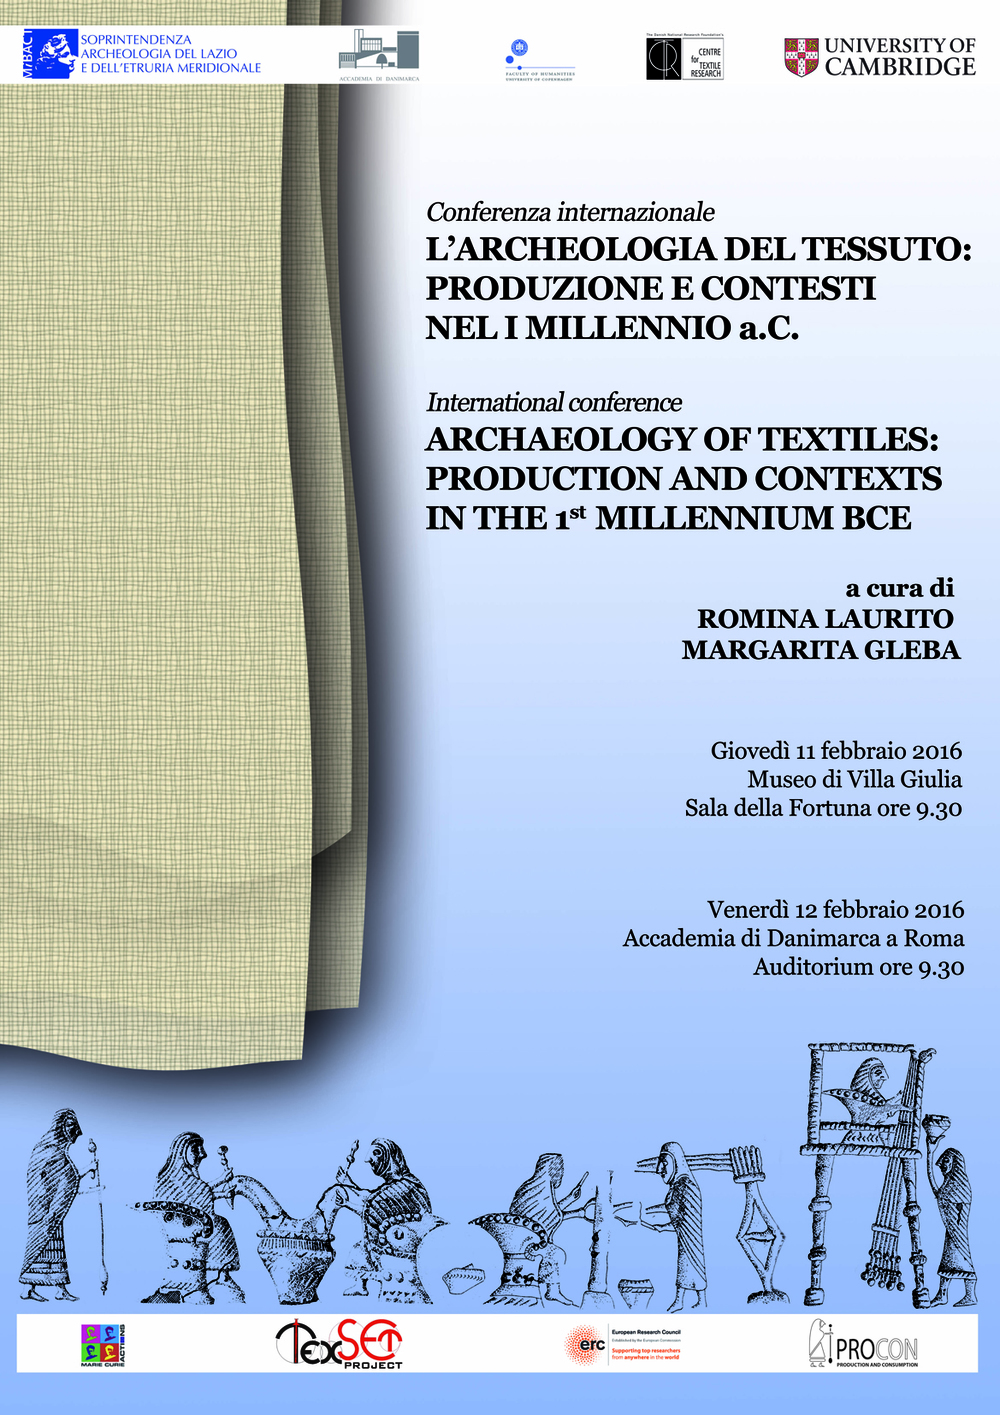 locandina_ARCHEOLOGIA DEI TESSUTI_febbraio2016_BASSA RIS.jpg